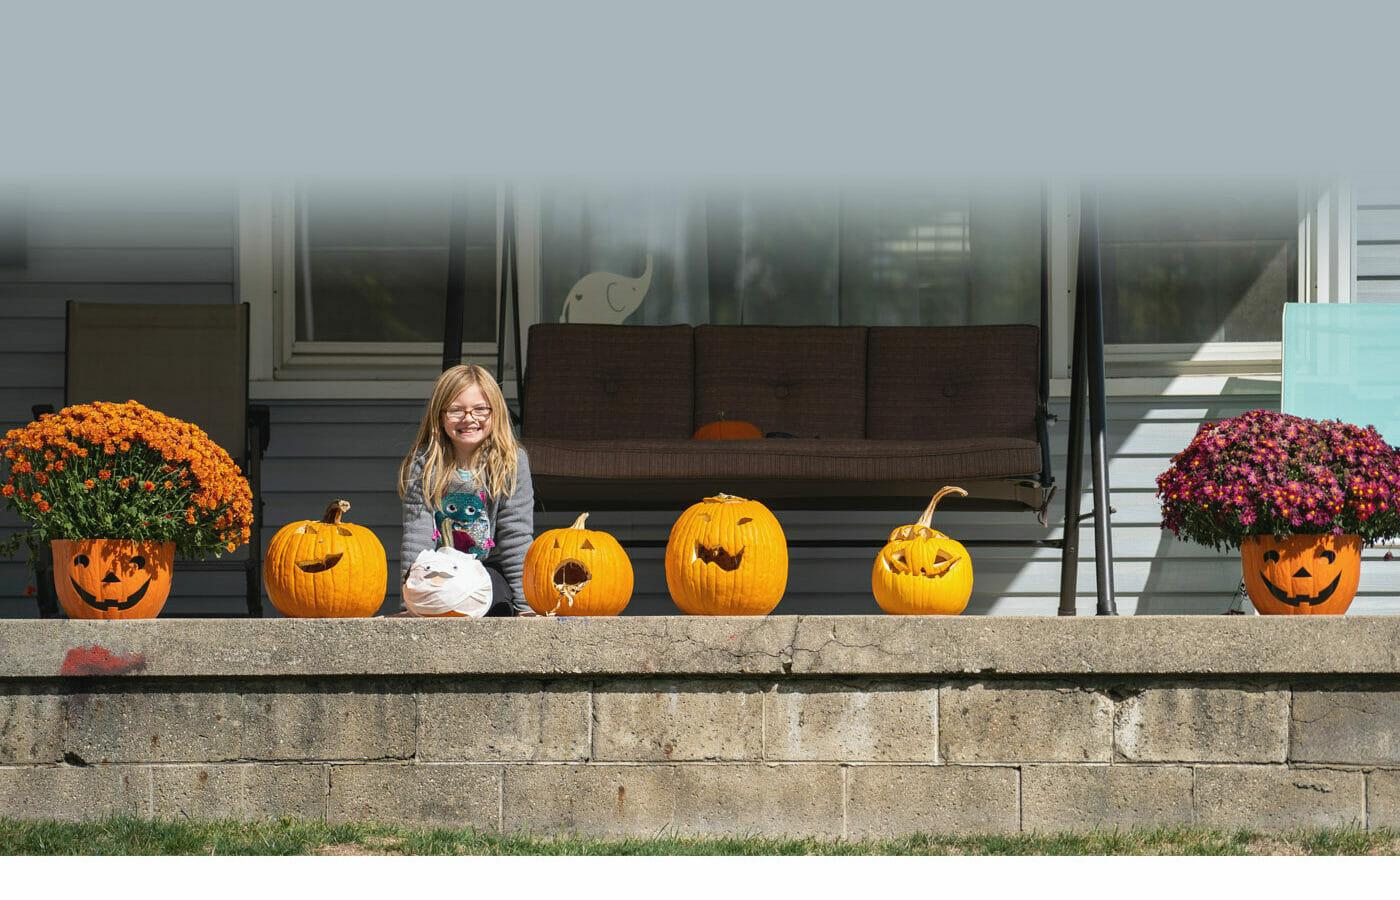 Girl posing with pumpkins